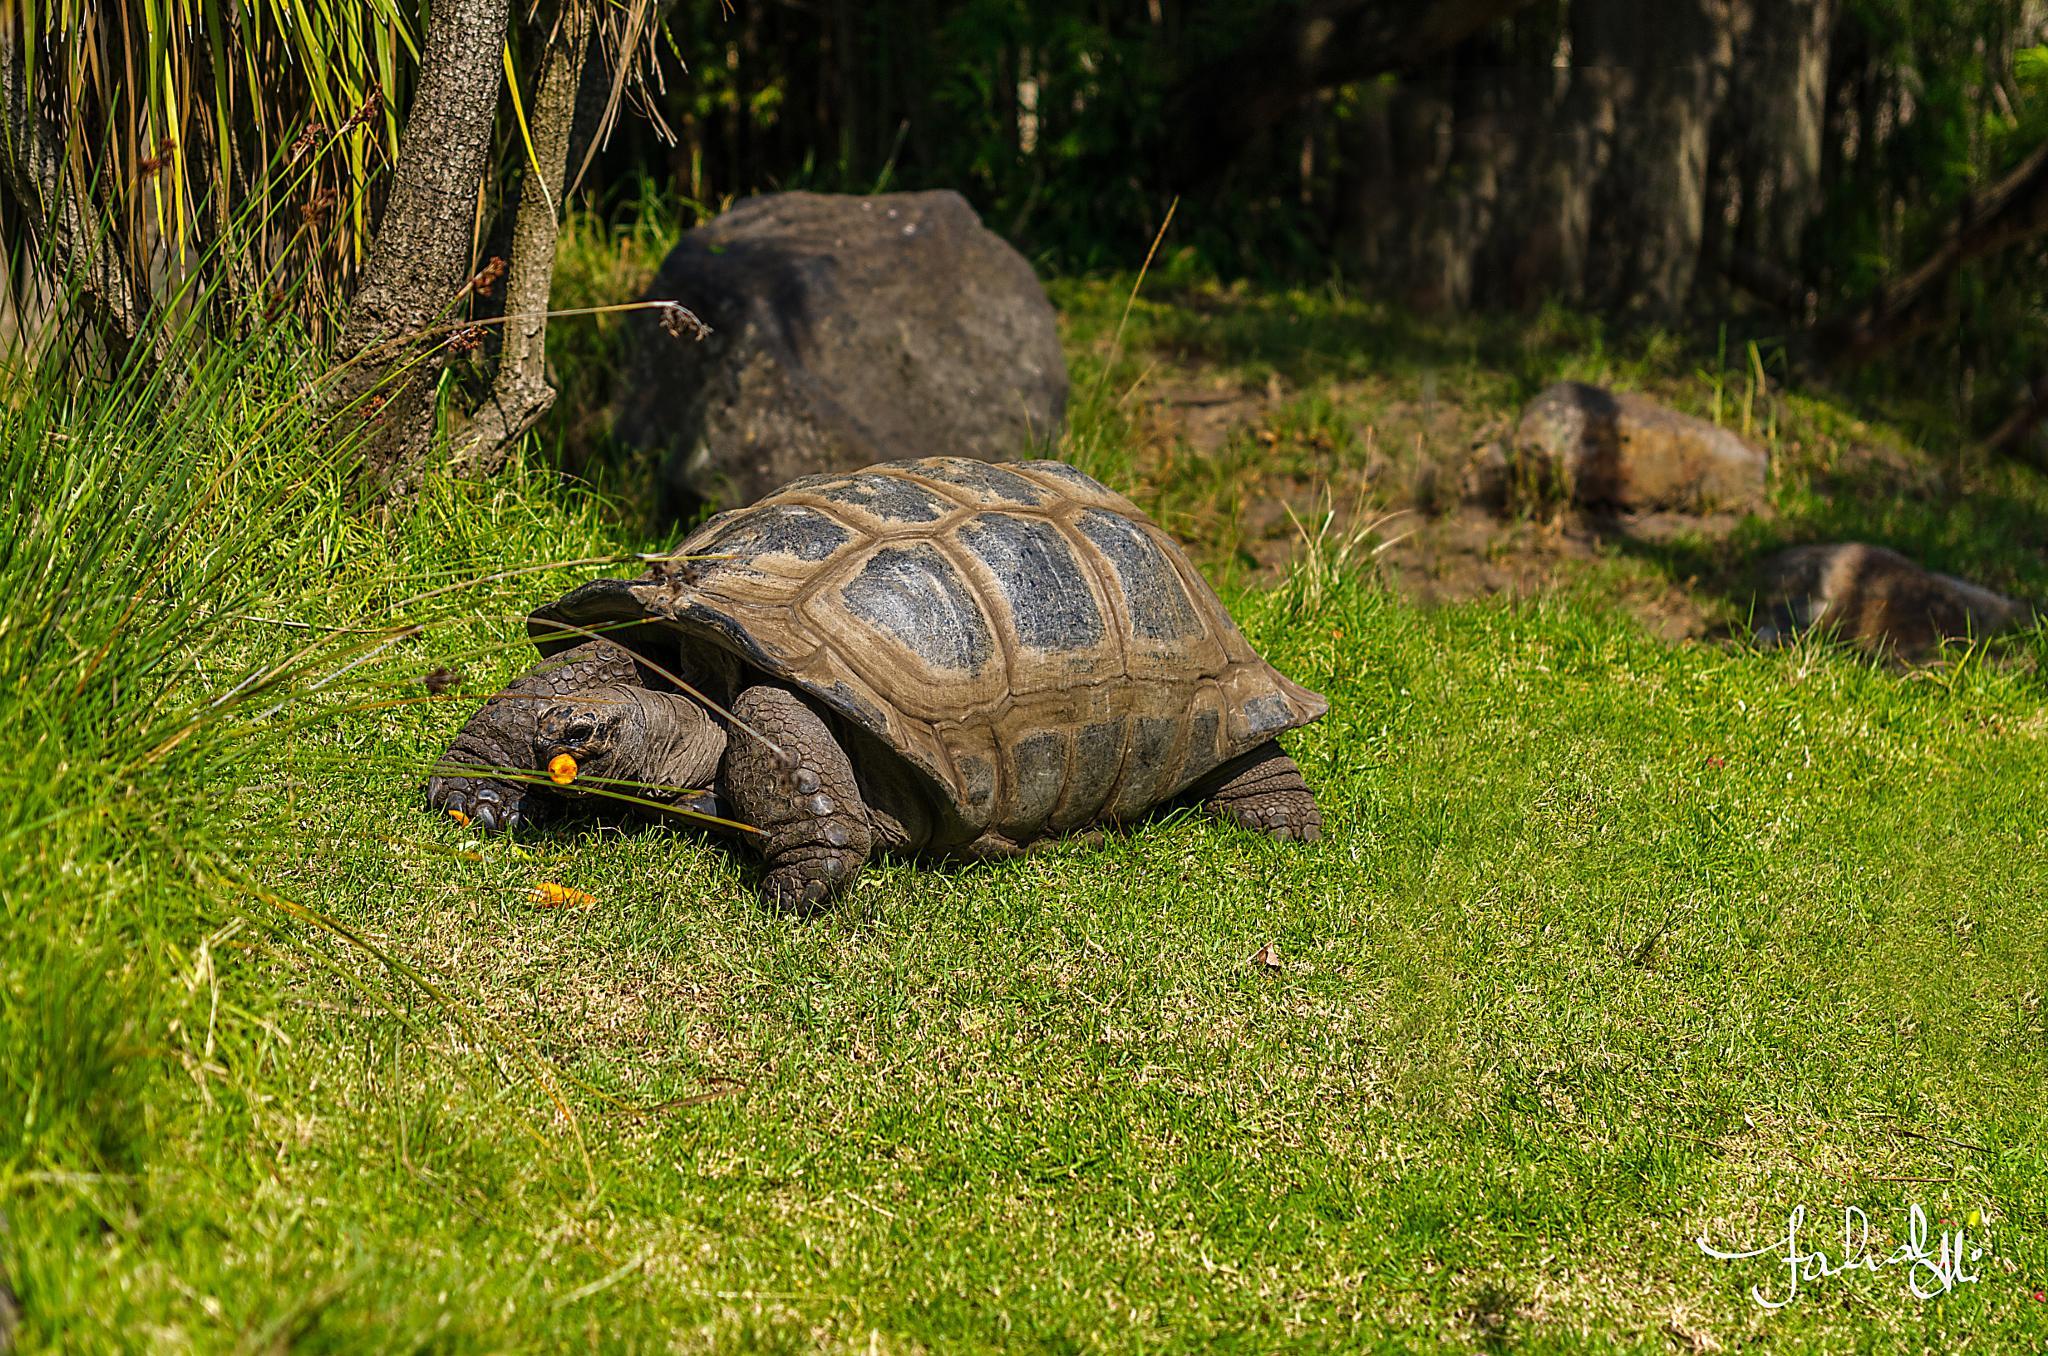 Giant Tortoises by Fahad Bhatti